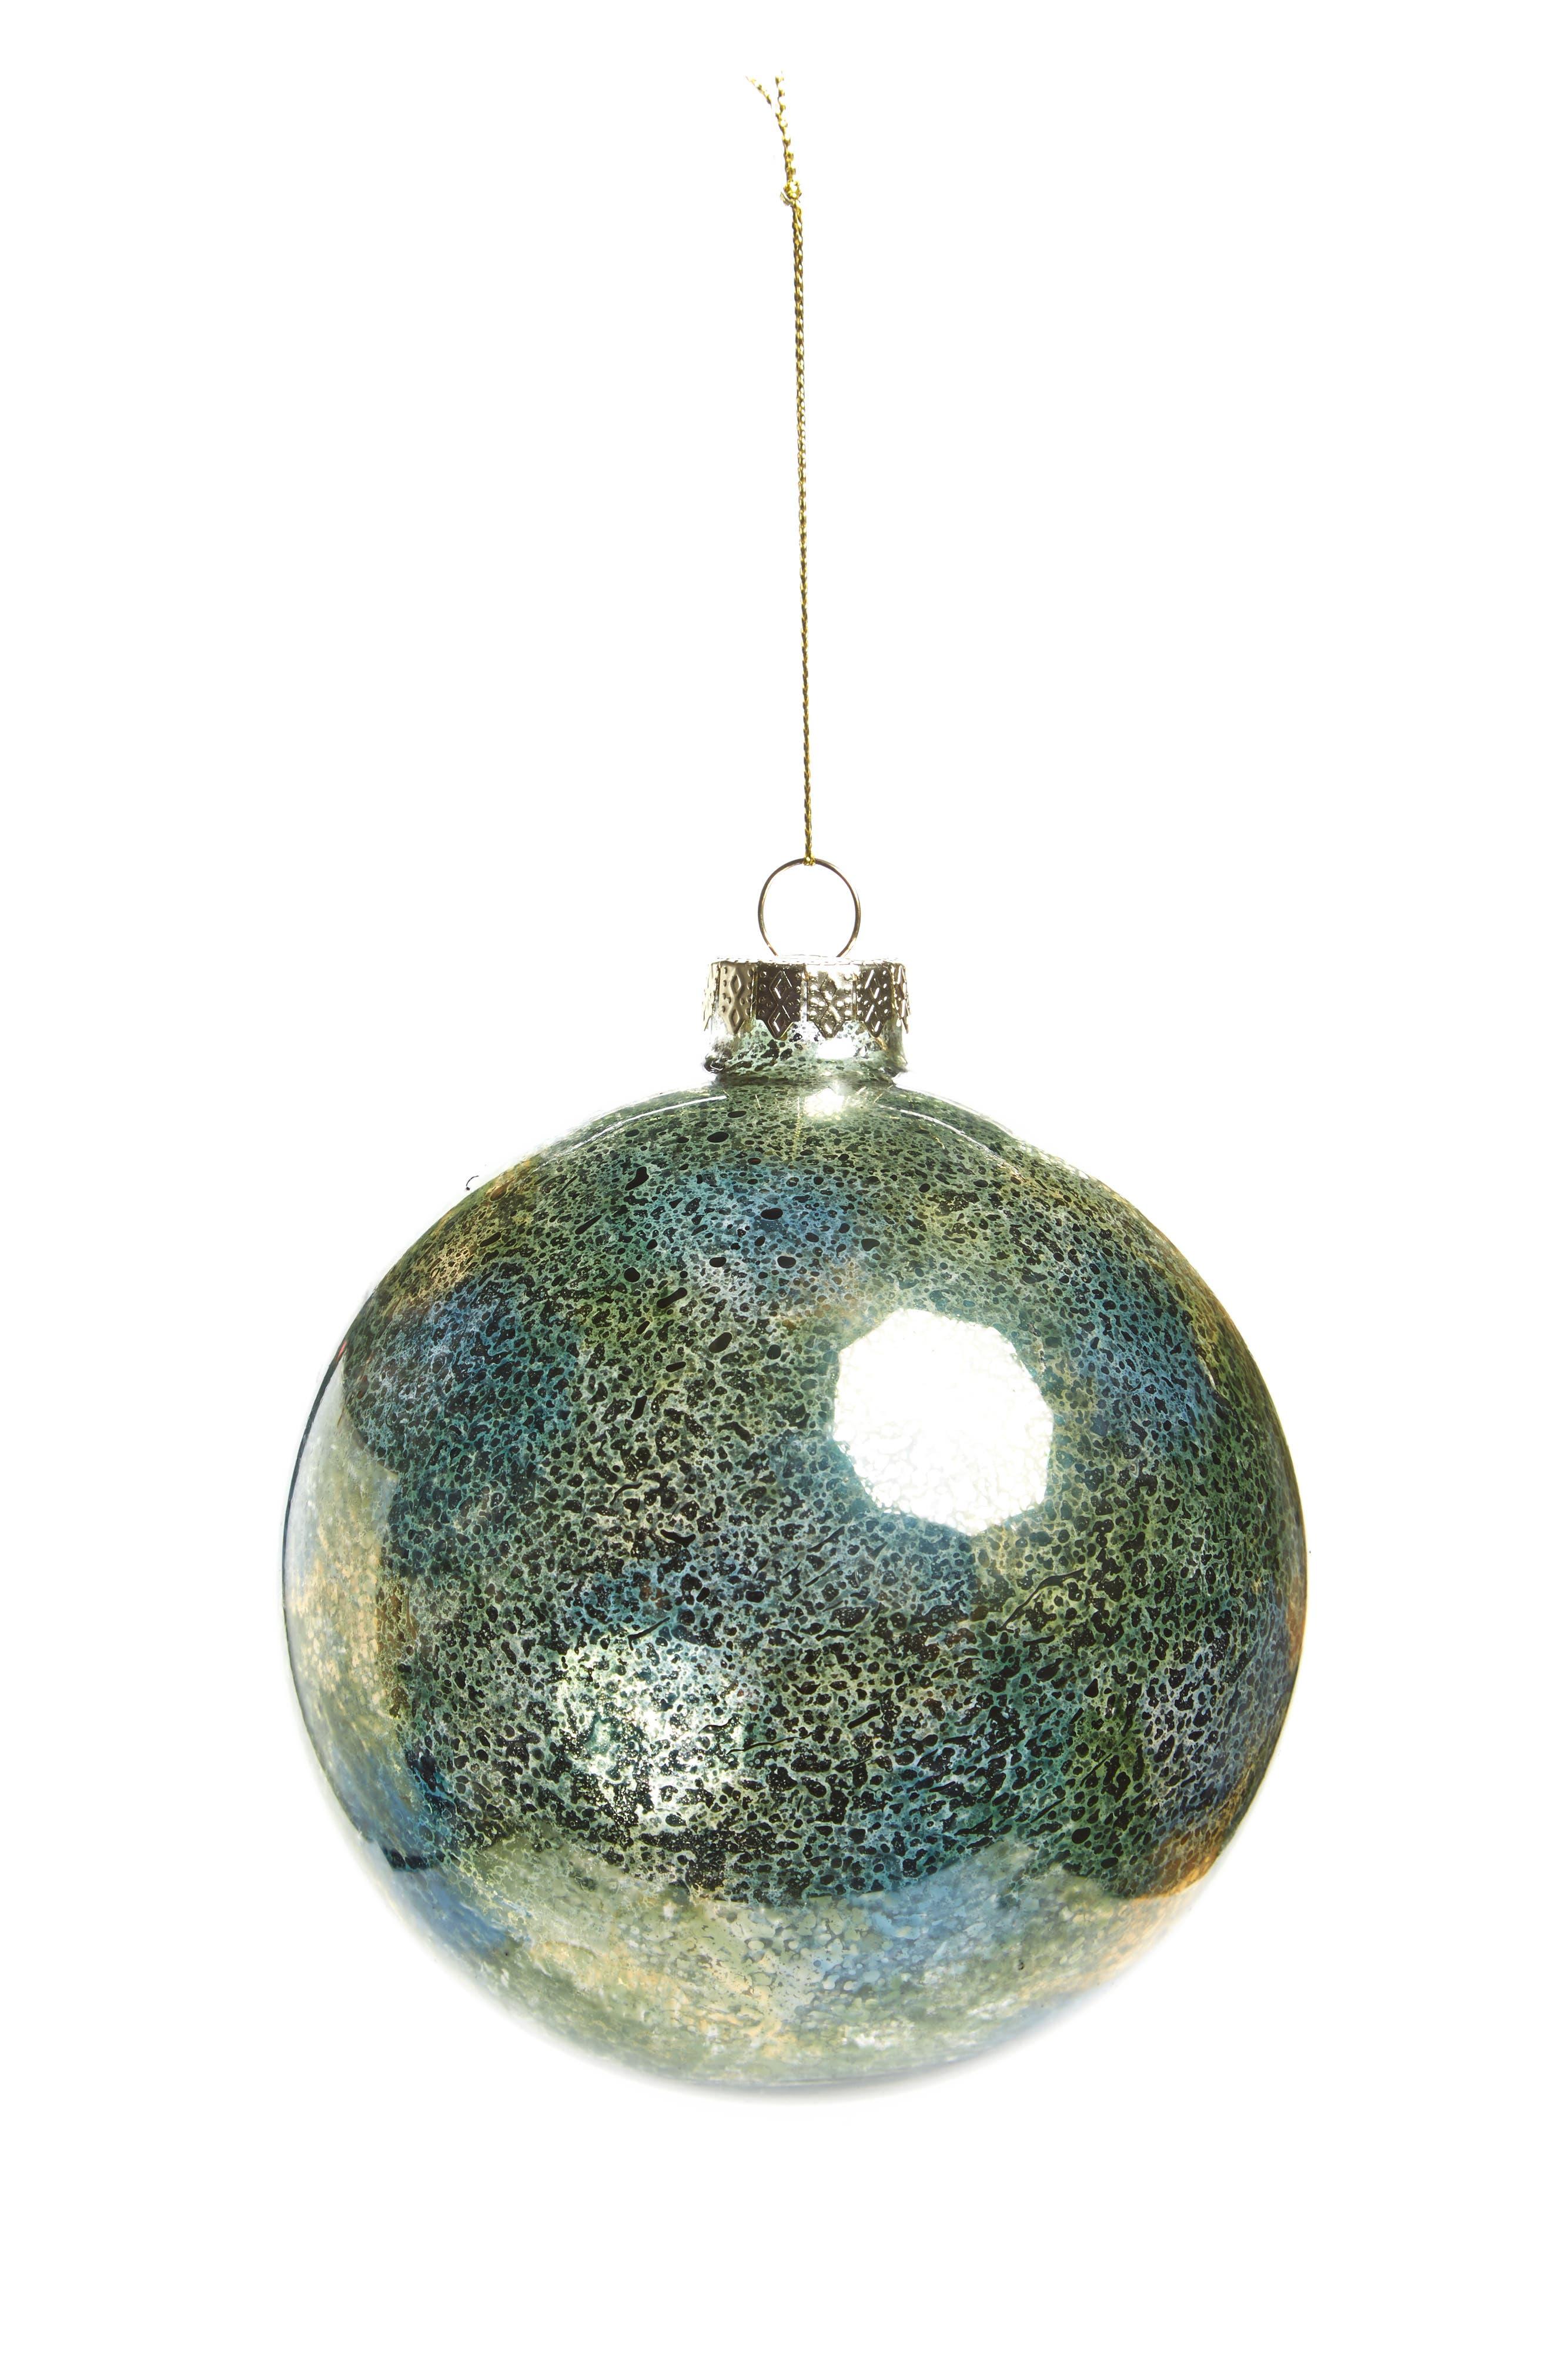 Mercury Glass Ball Ornament,                             Main thumbnail 1, color,                             300